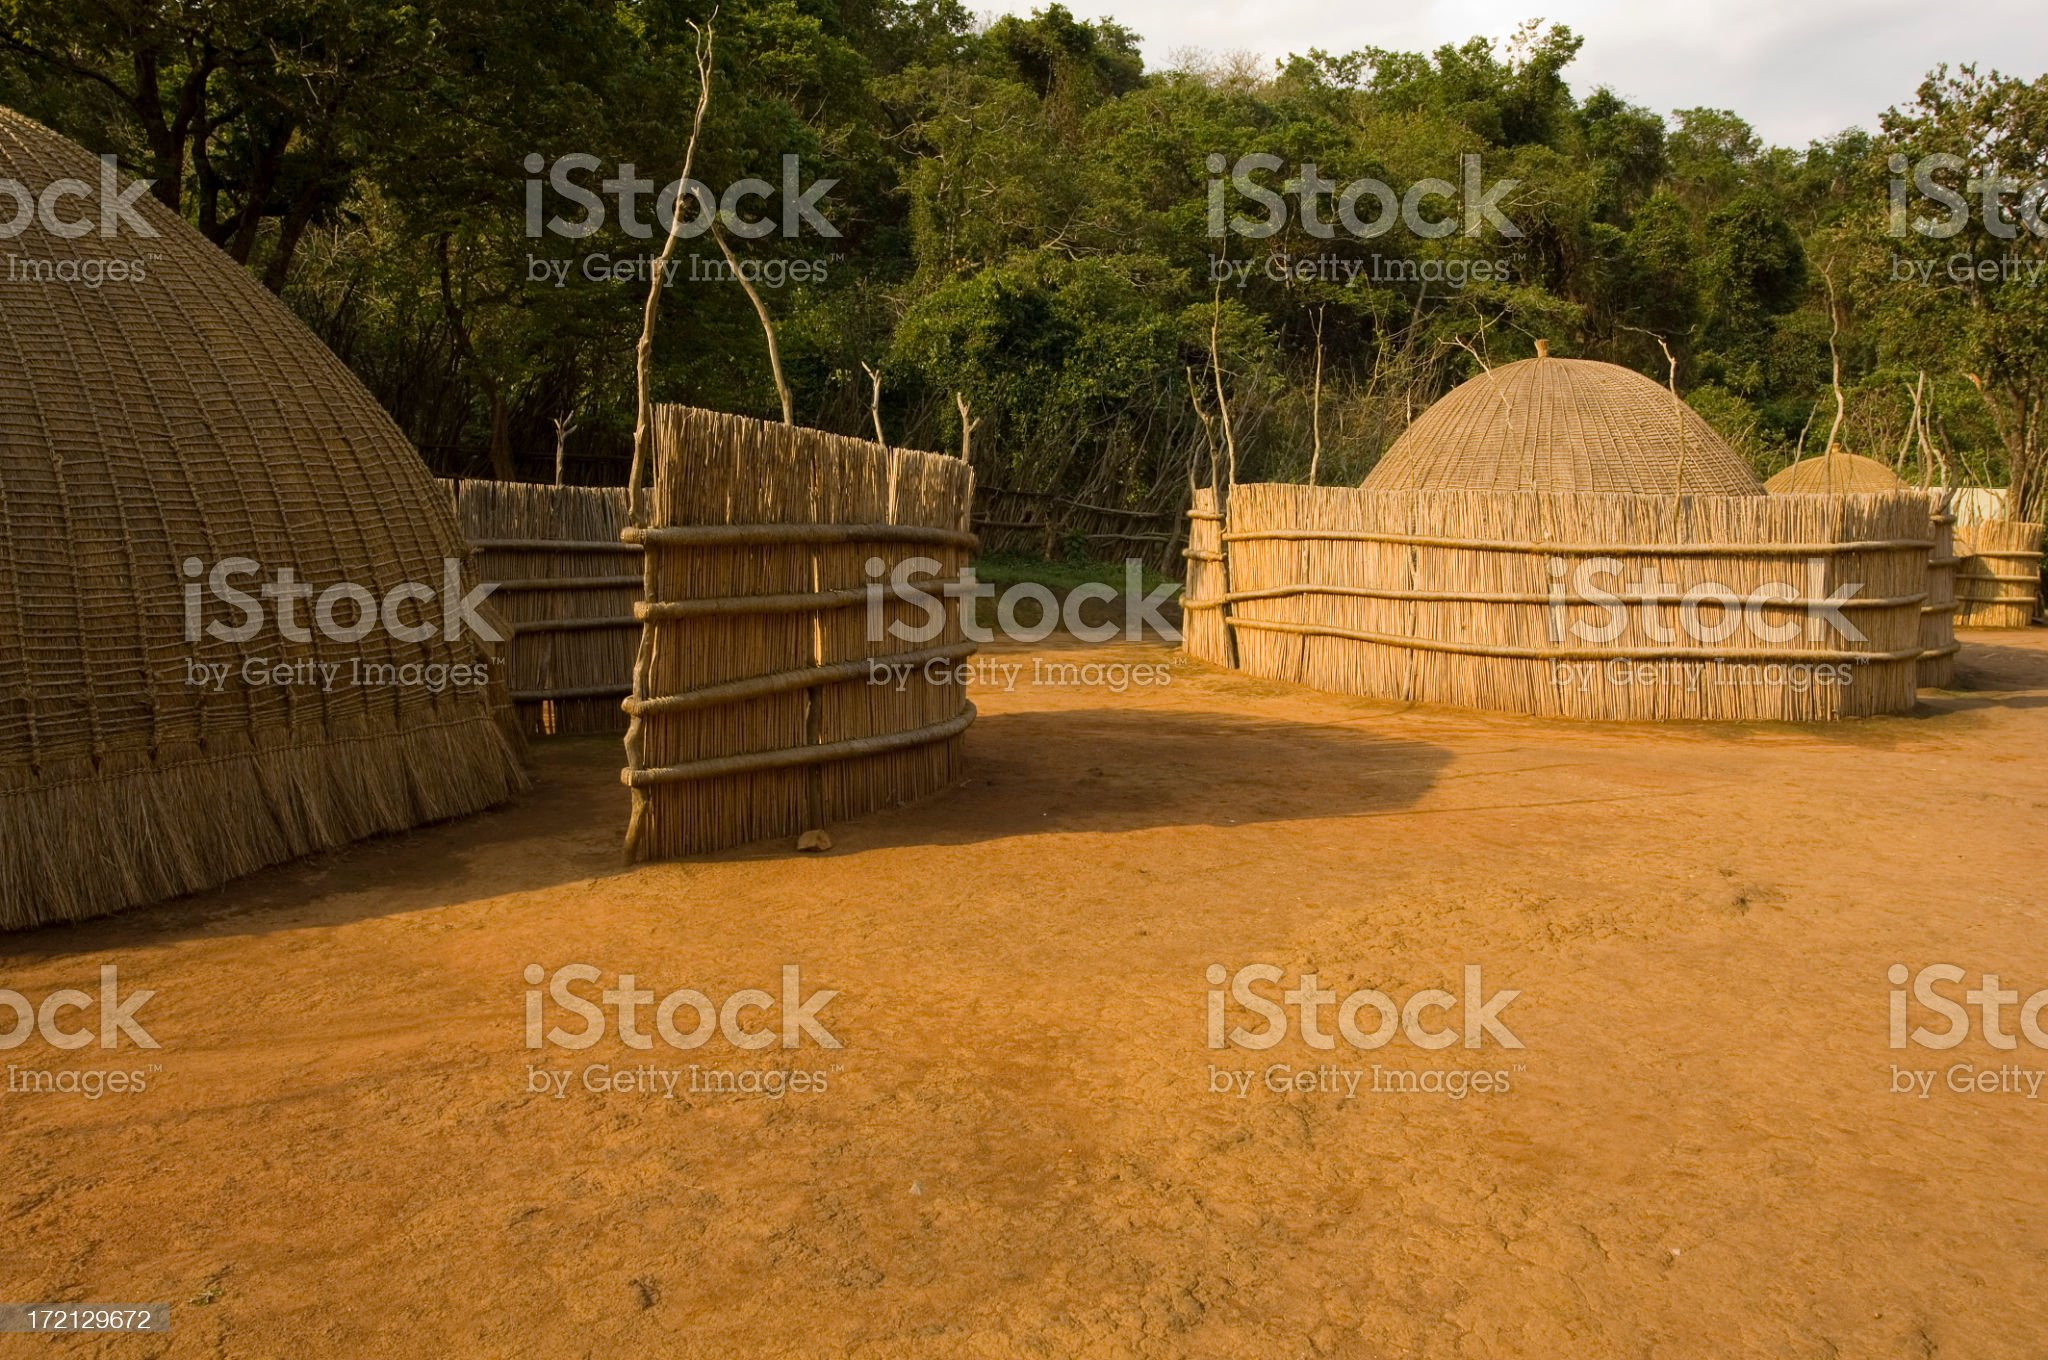 Swazi-008 royalty-free stock photo